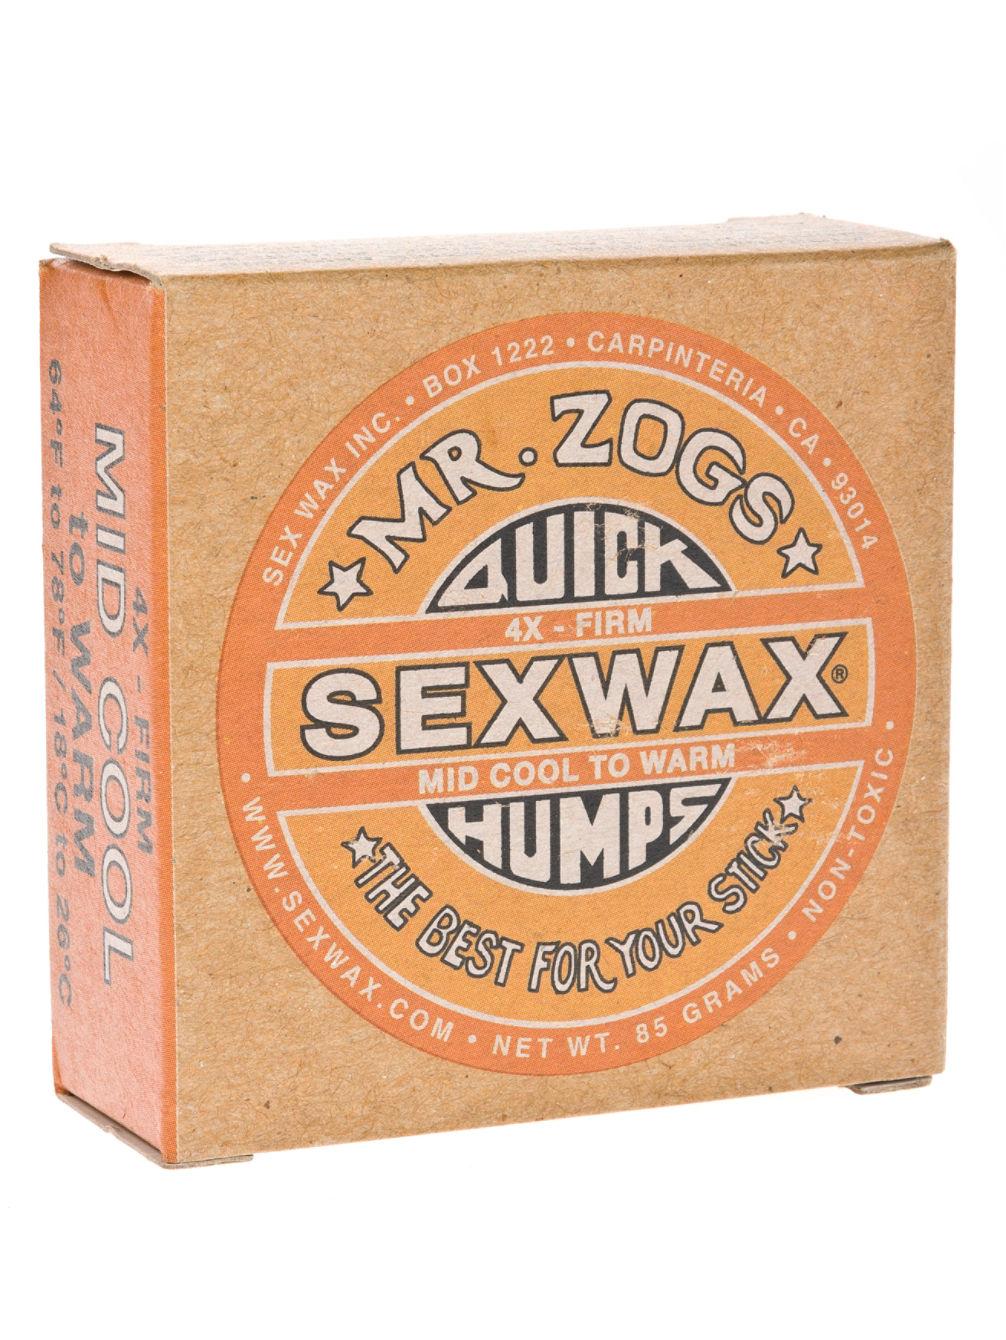 sex-wax-quick-humps-orange-firm